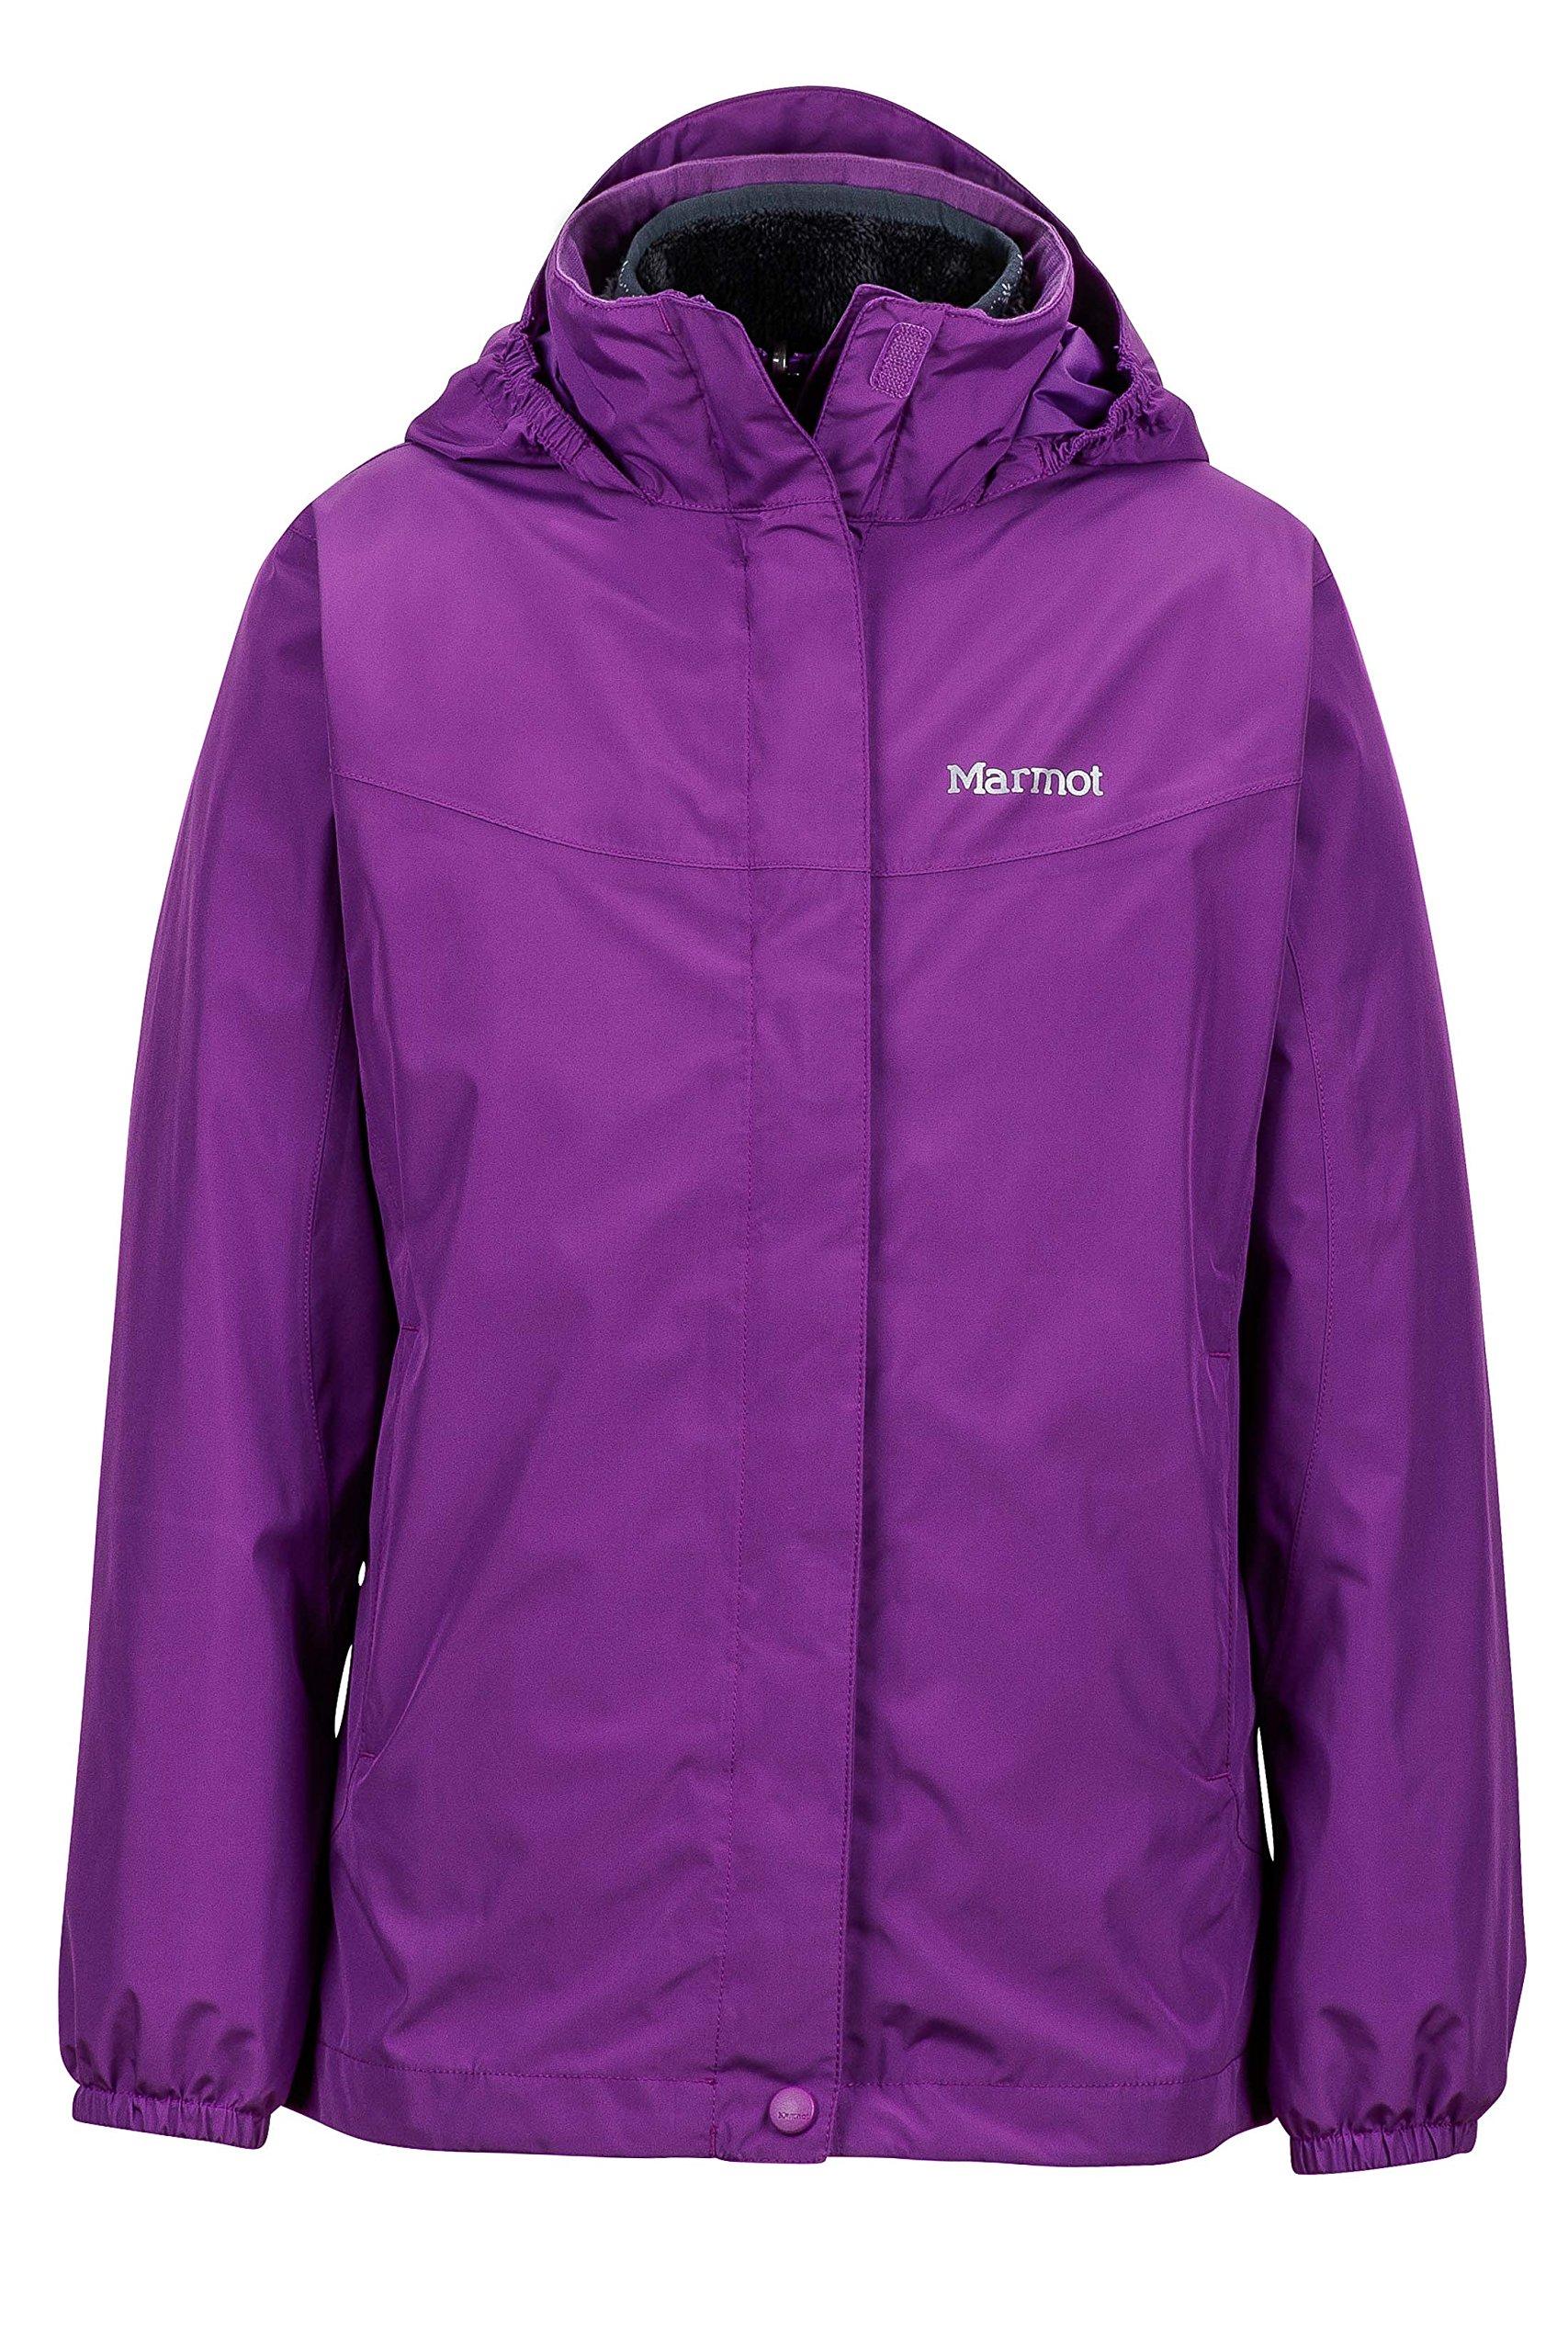 Marmot Northshore Girls' Waterproof Hooded Rain Jacket with Removable Fleece Liner, Mystic Purple, Small by Marmot